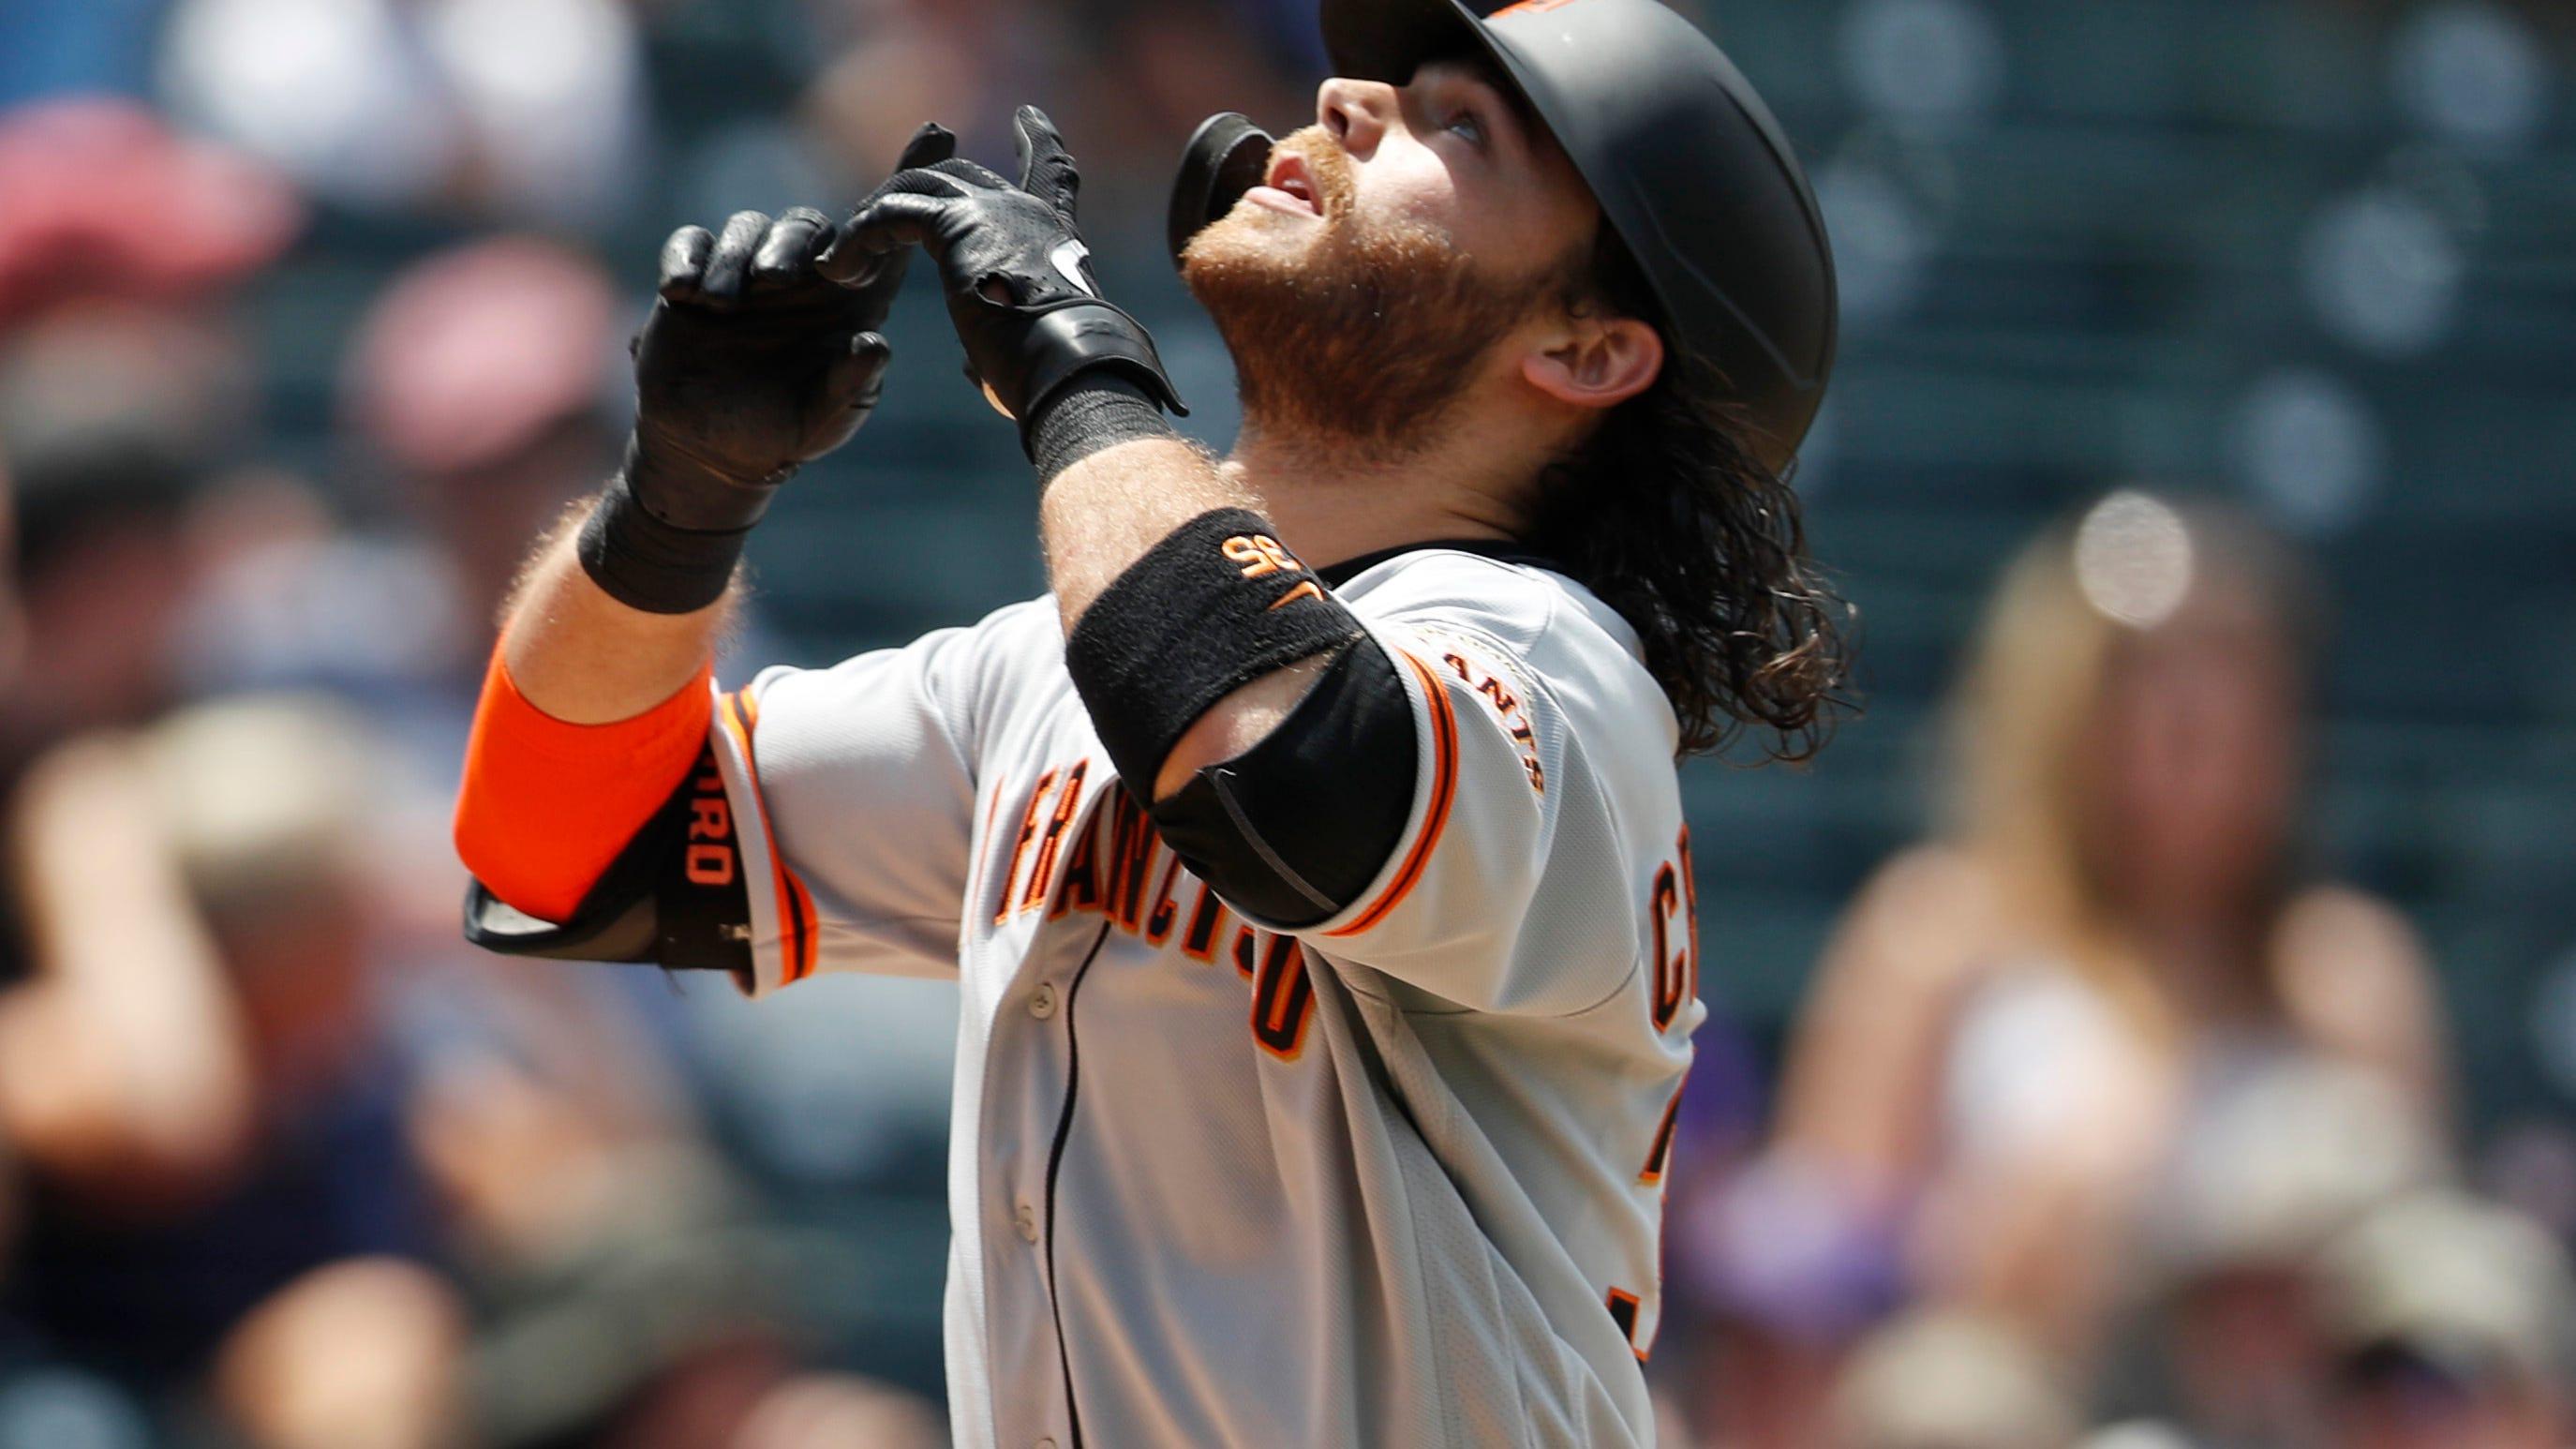 Brandon Crawford San Francisco Giants Baseball Player Jersey